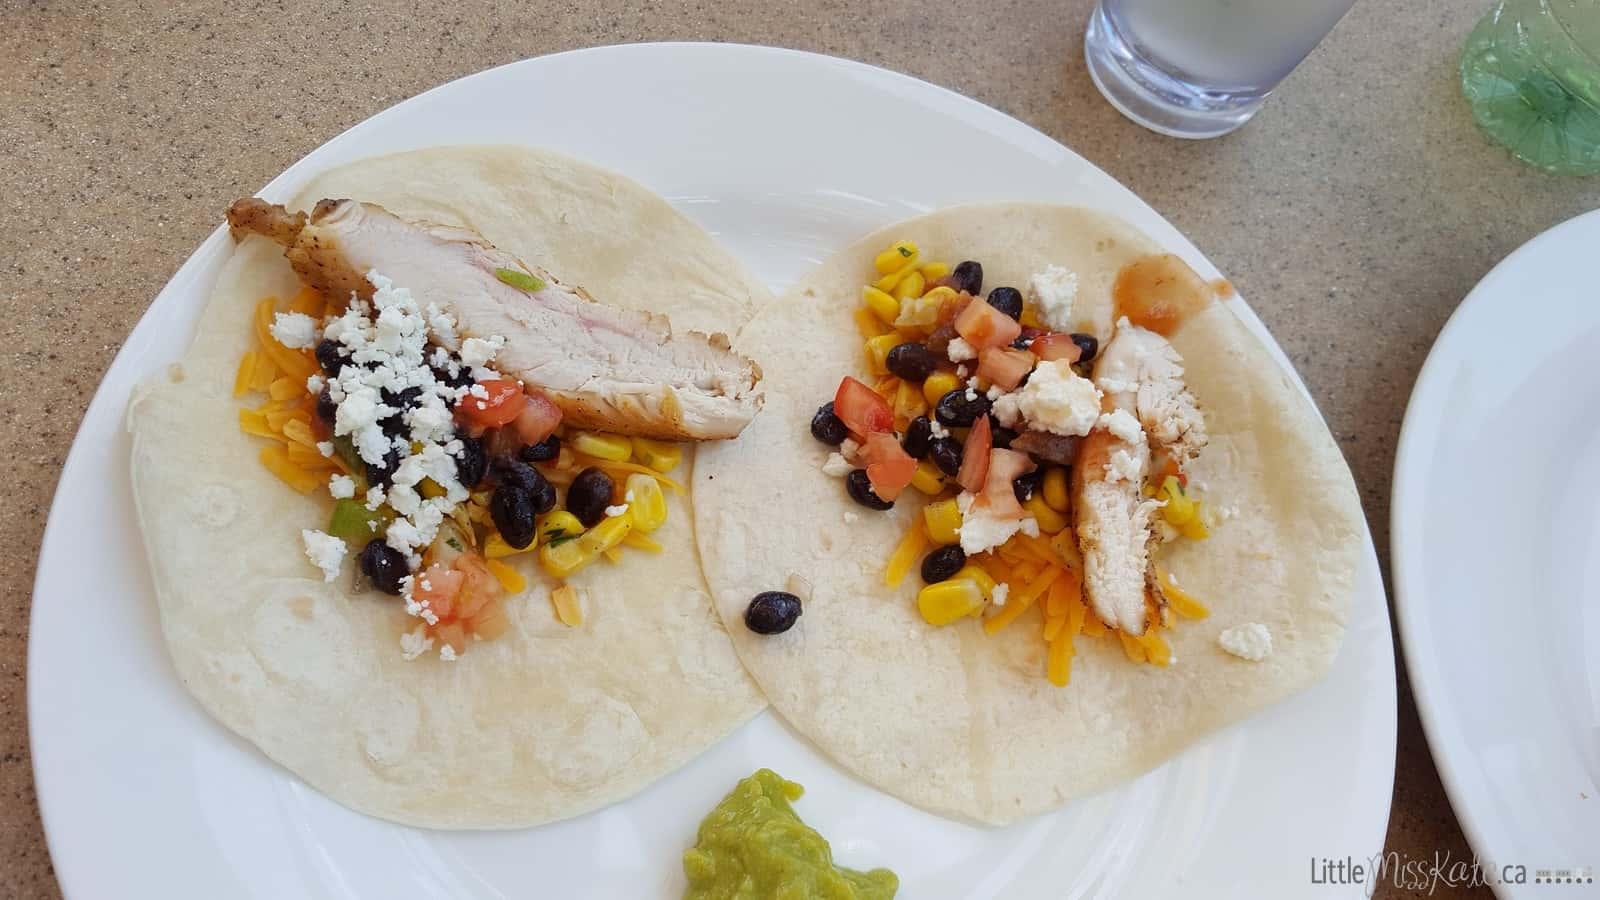 Beaches Resort Villages Turks and Caicos Restaurants - Arizona's Tex Mex via littlemisskate.ca